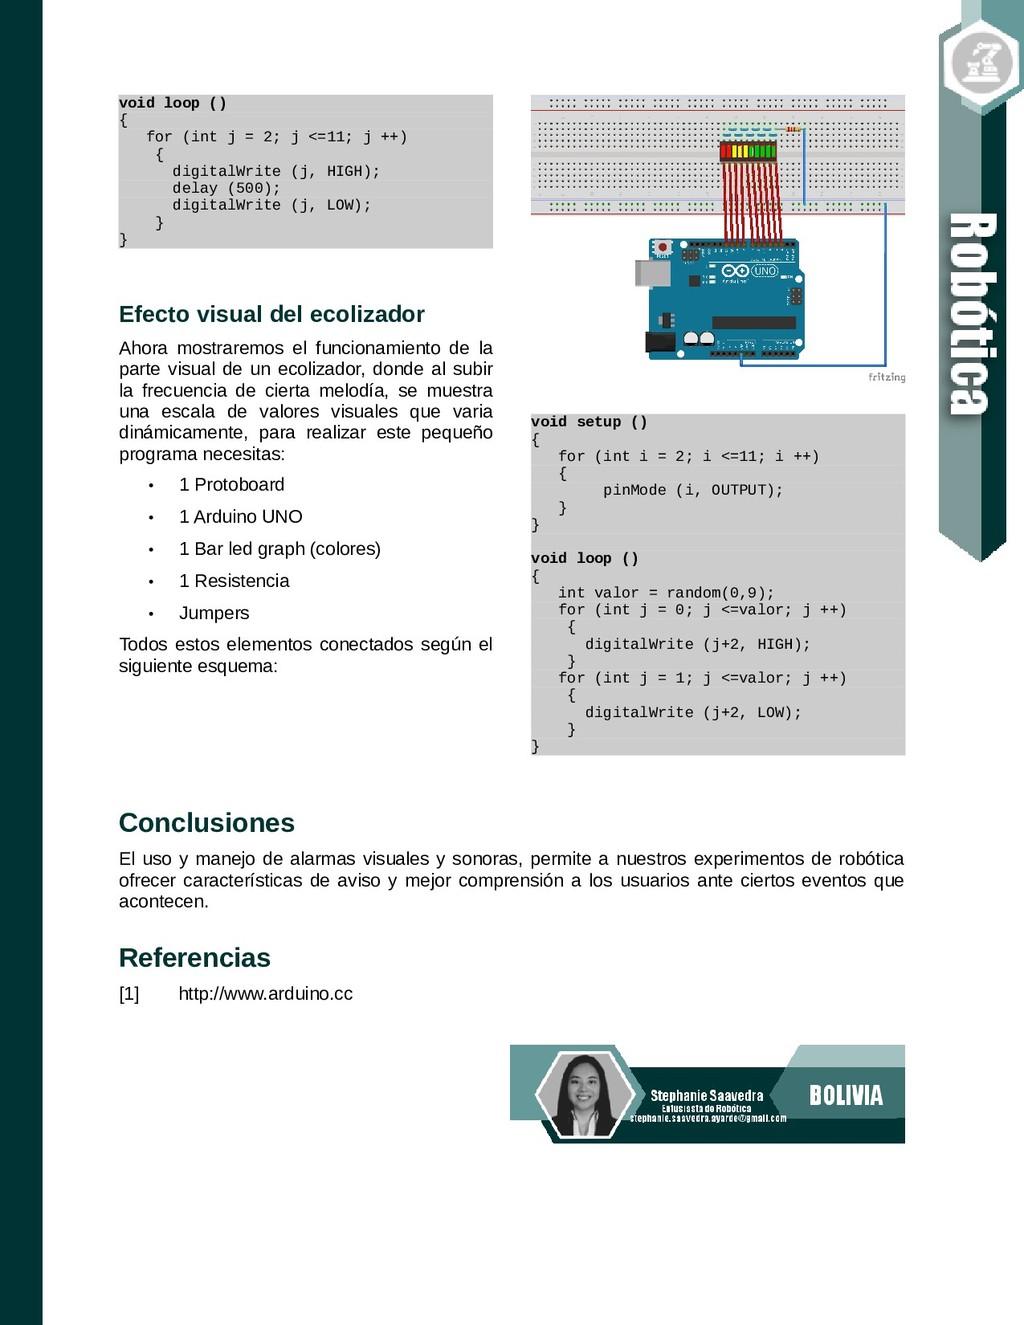 void loop () { for (int j = 2; j <=11; j ++) { ...